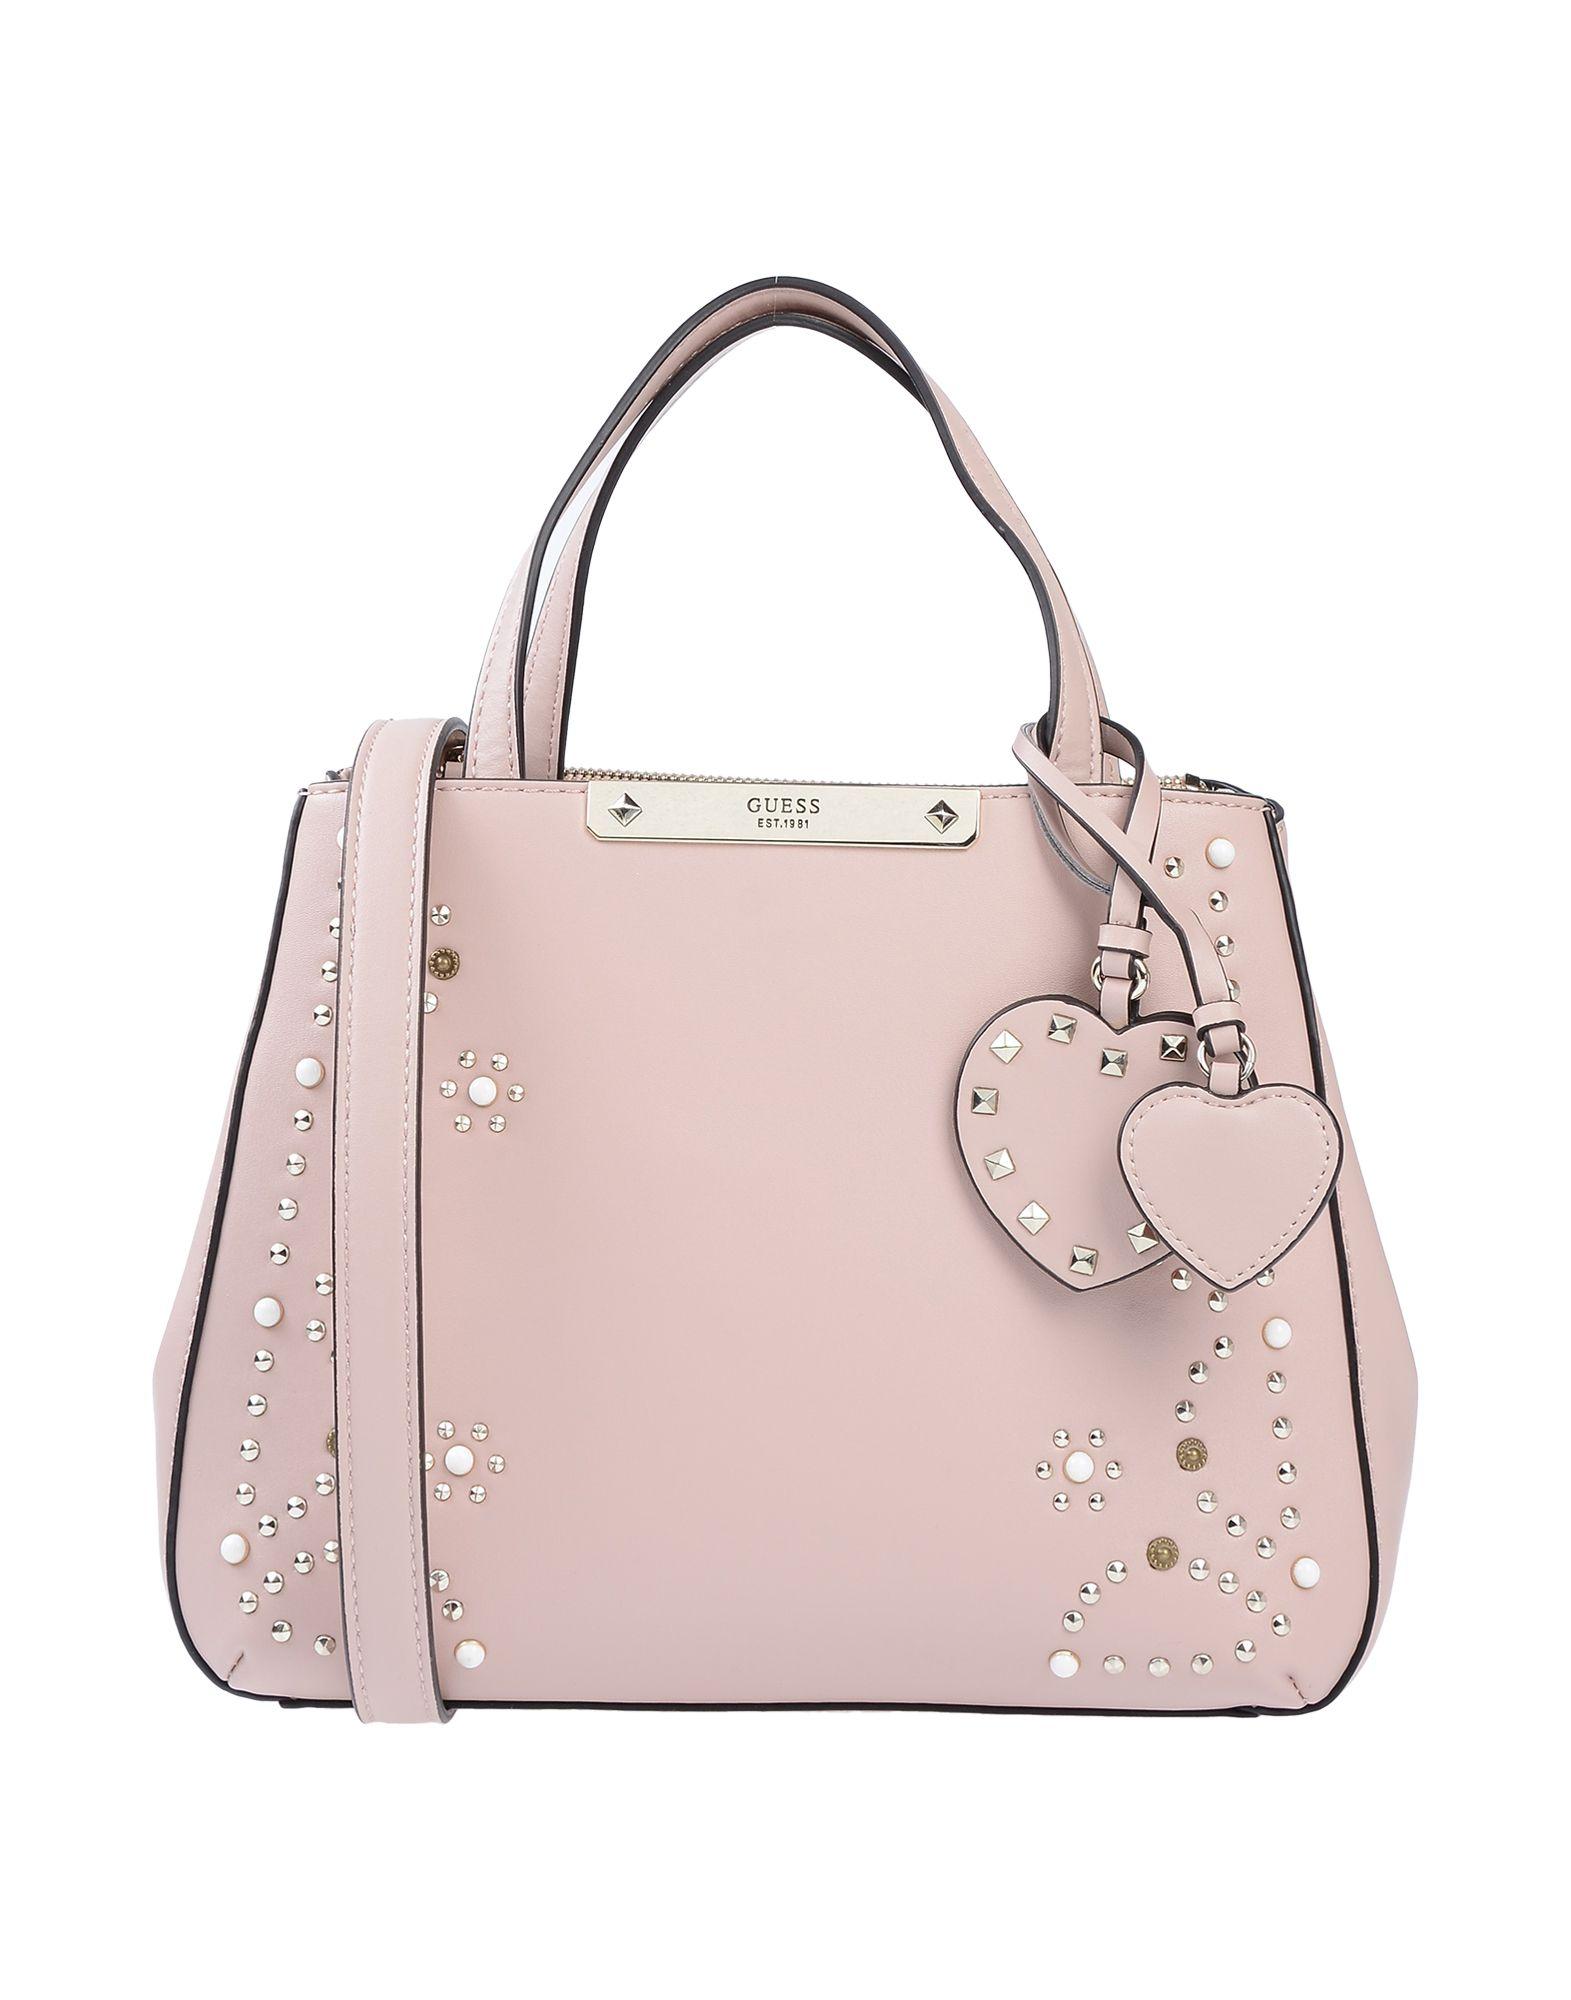 Guess Handbag Handbags Yoox Com